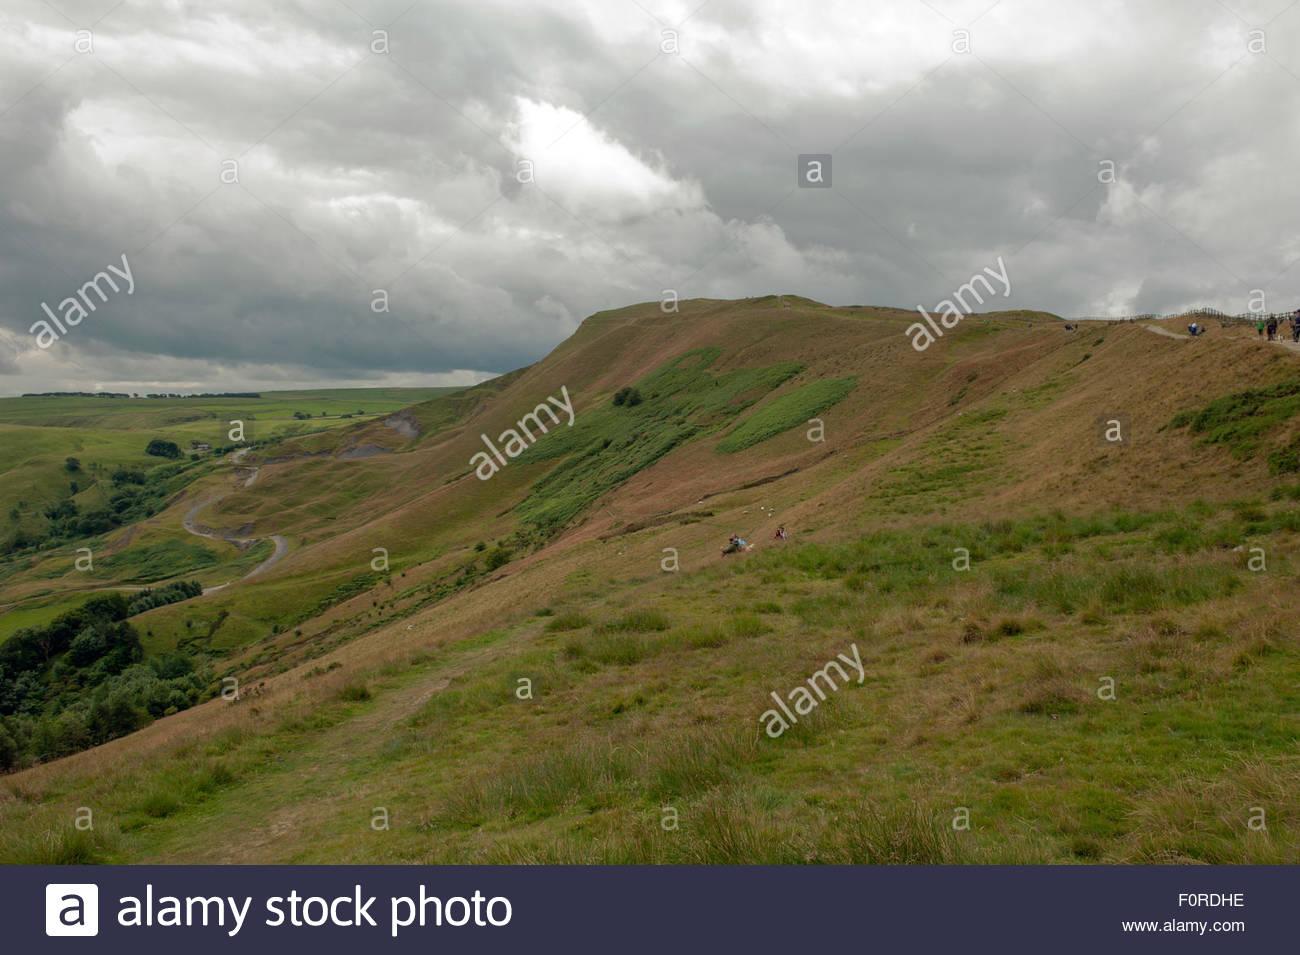 Edale, Derbyshire UK. Peak District National Park. View looking westwards along the south facing slopes towards - Stock Image